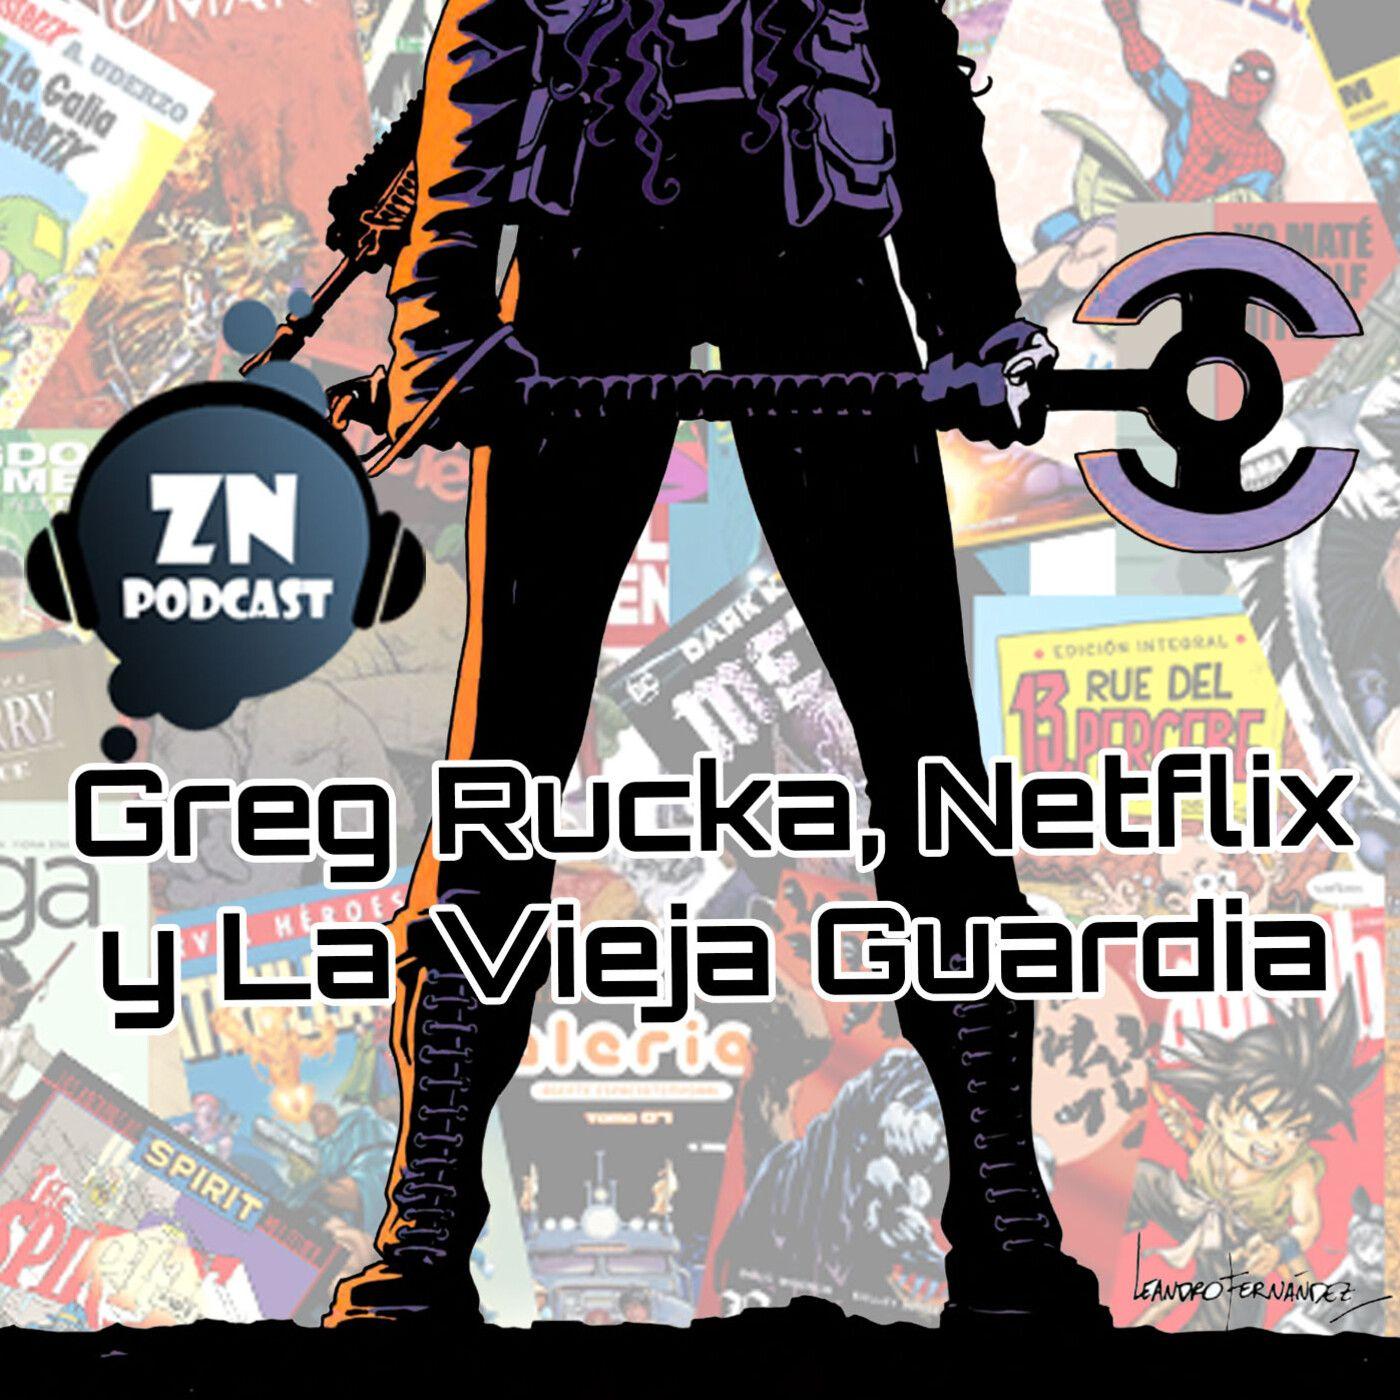 ZNPodcast #86 - Greg Rucka, Netflix y La Vieja Guardia